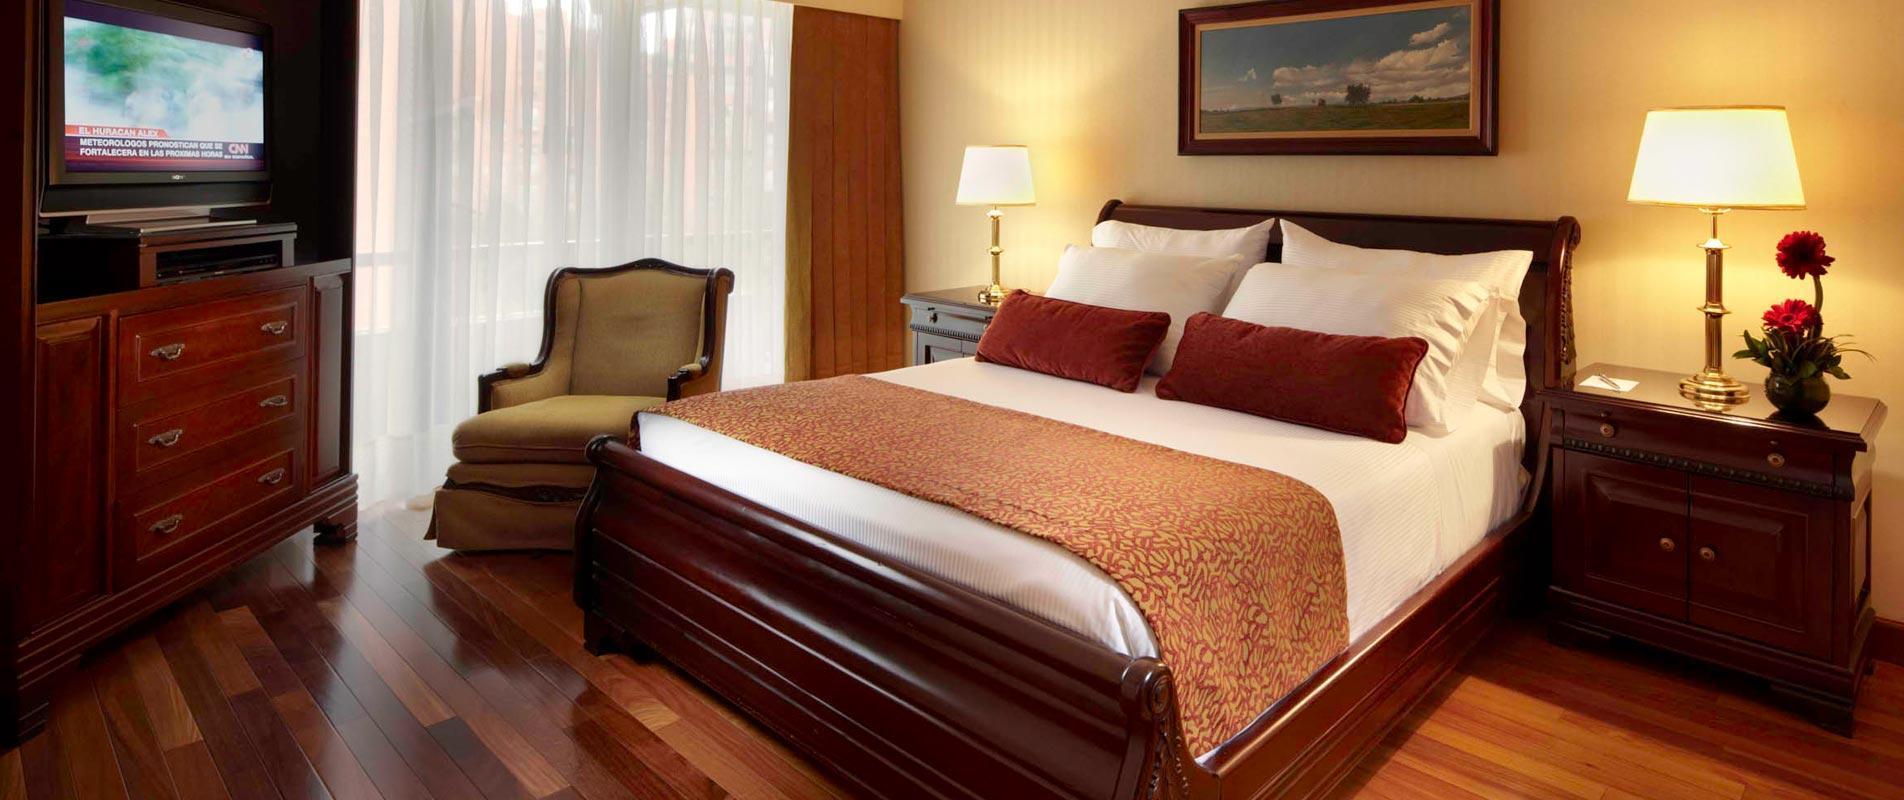 Room-La Fontana